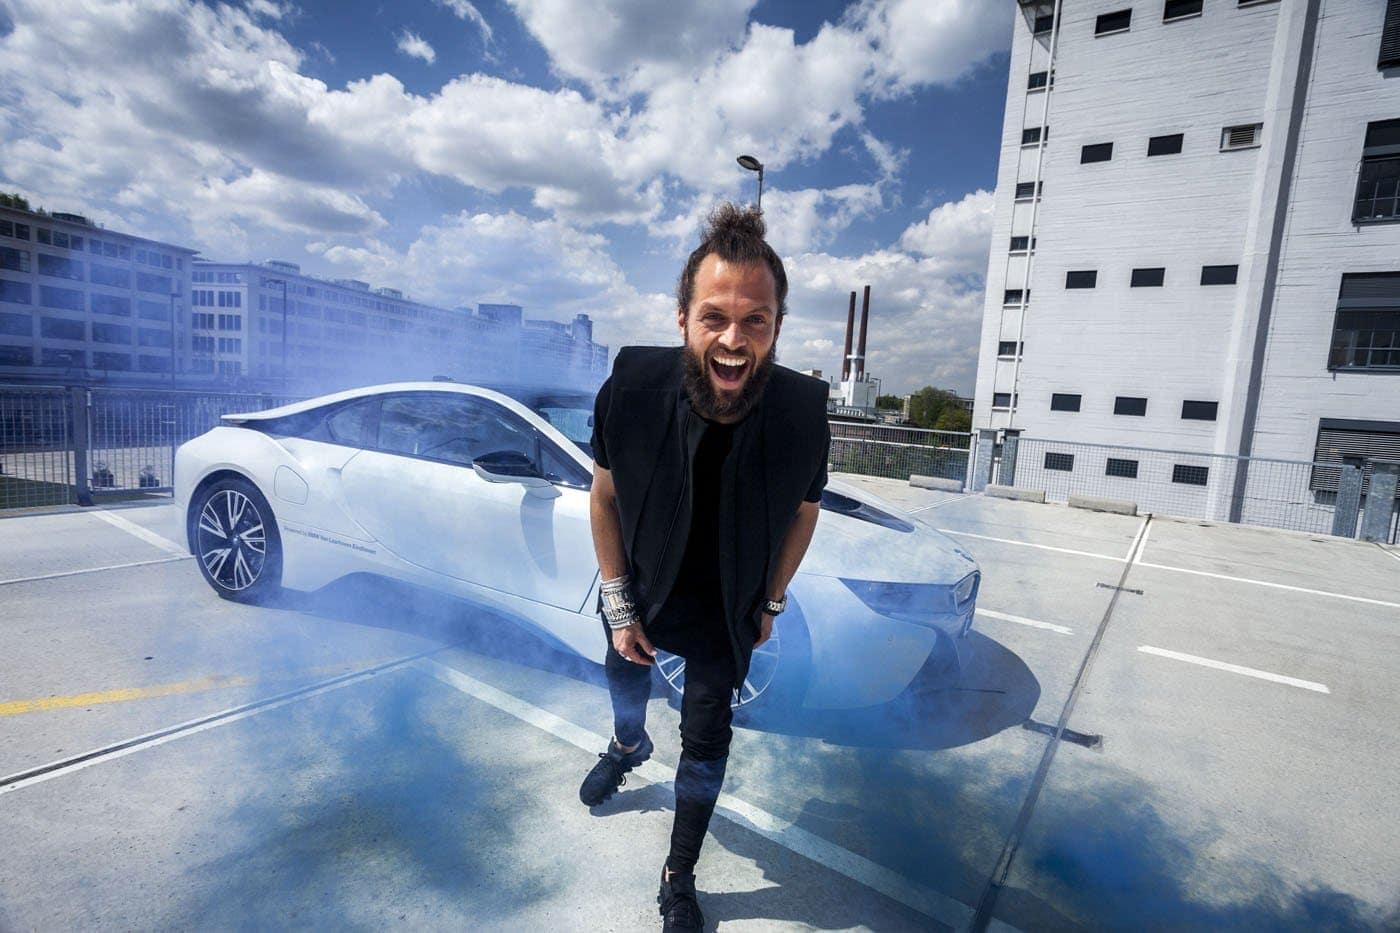 DJ La Fuente Autogespot